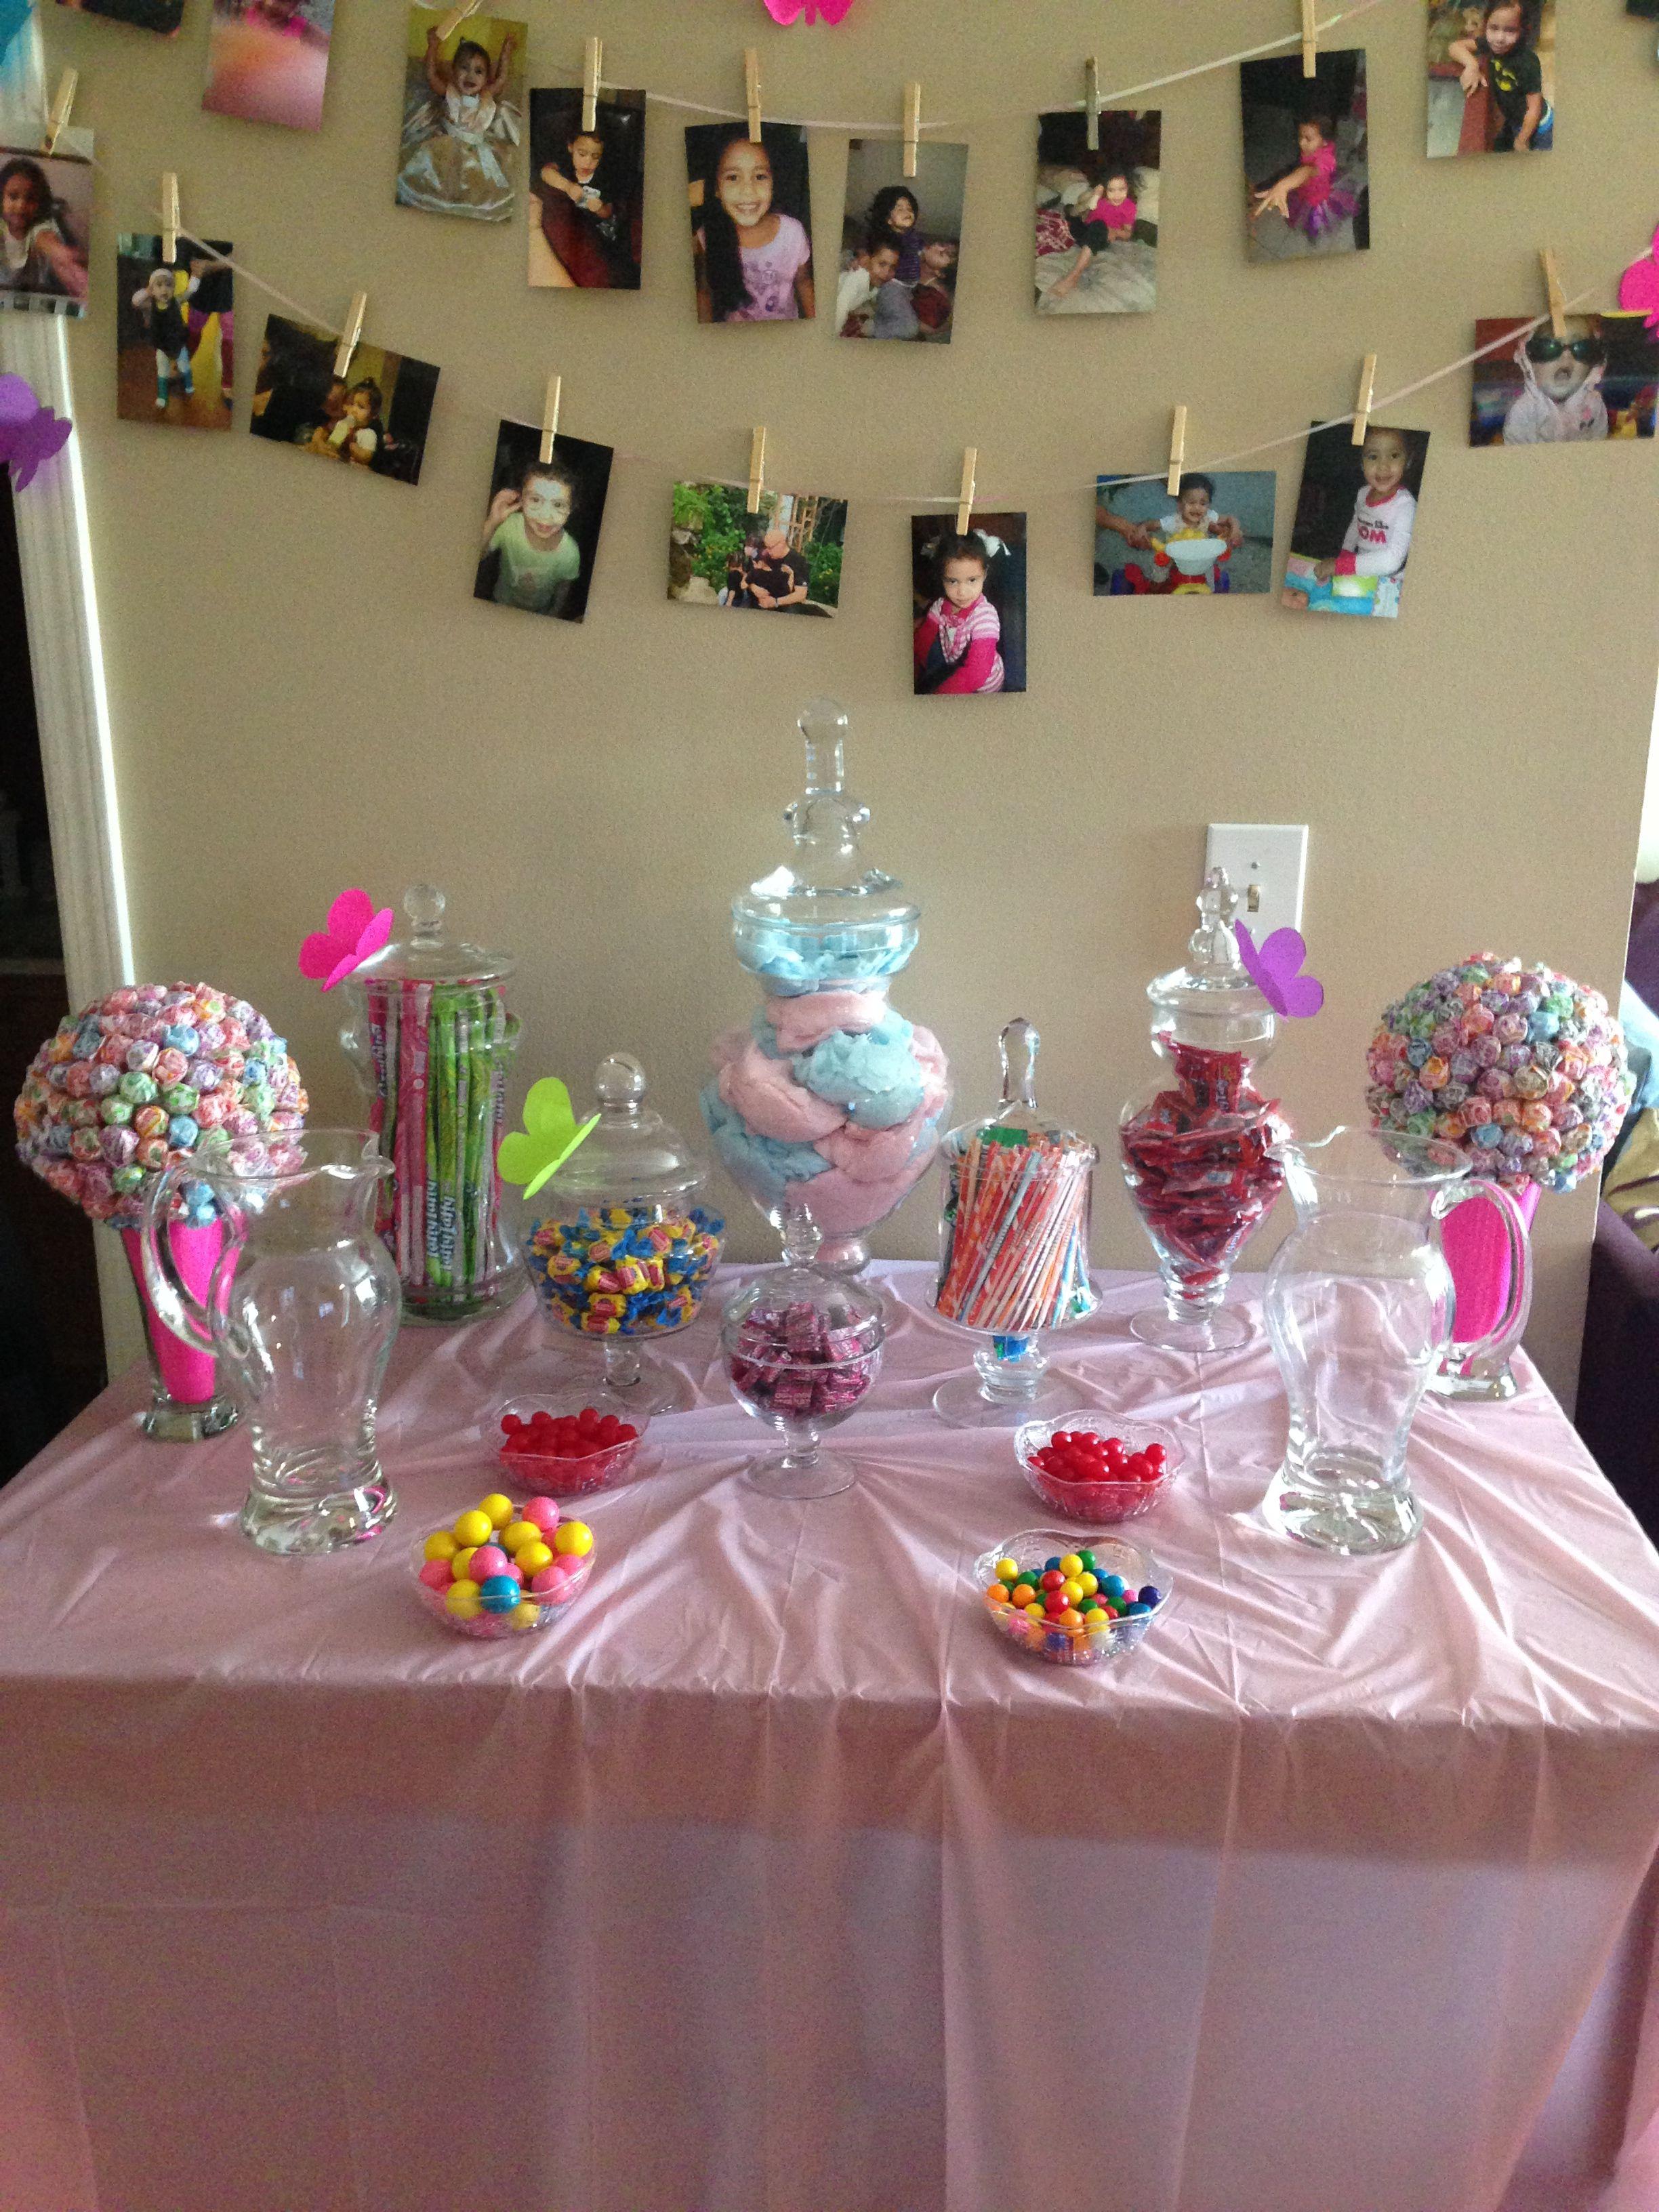 Unicorn Candy Table Ideas : unicorn, candy, table, ideas, Candy, Table, Unicorn, Birthday, Parties,, Birthday,